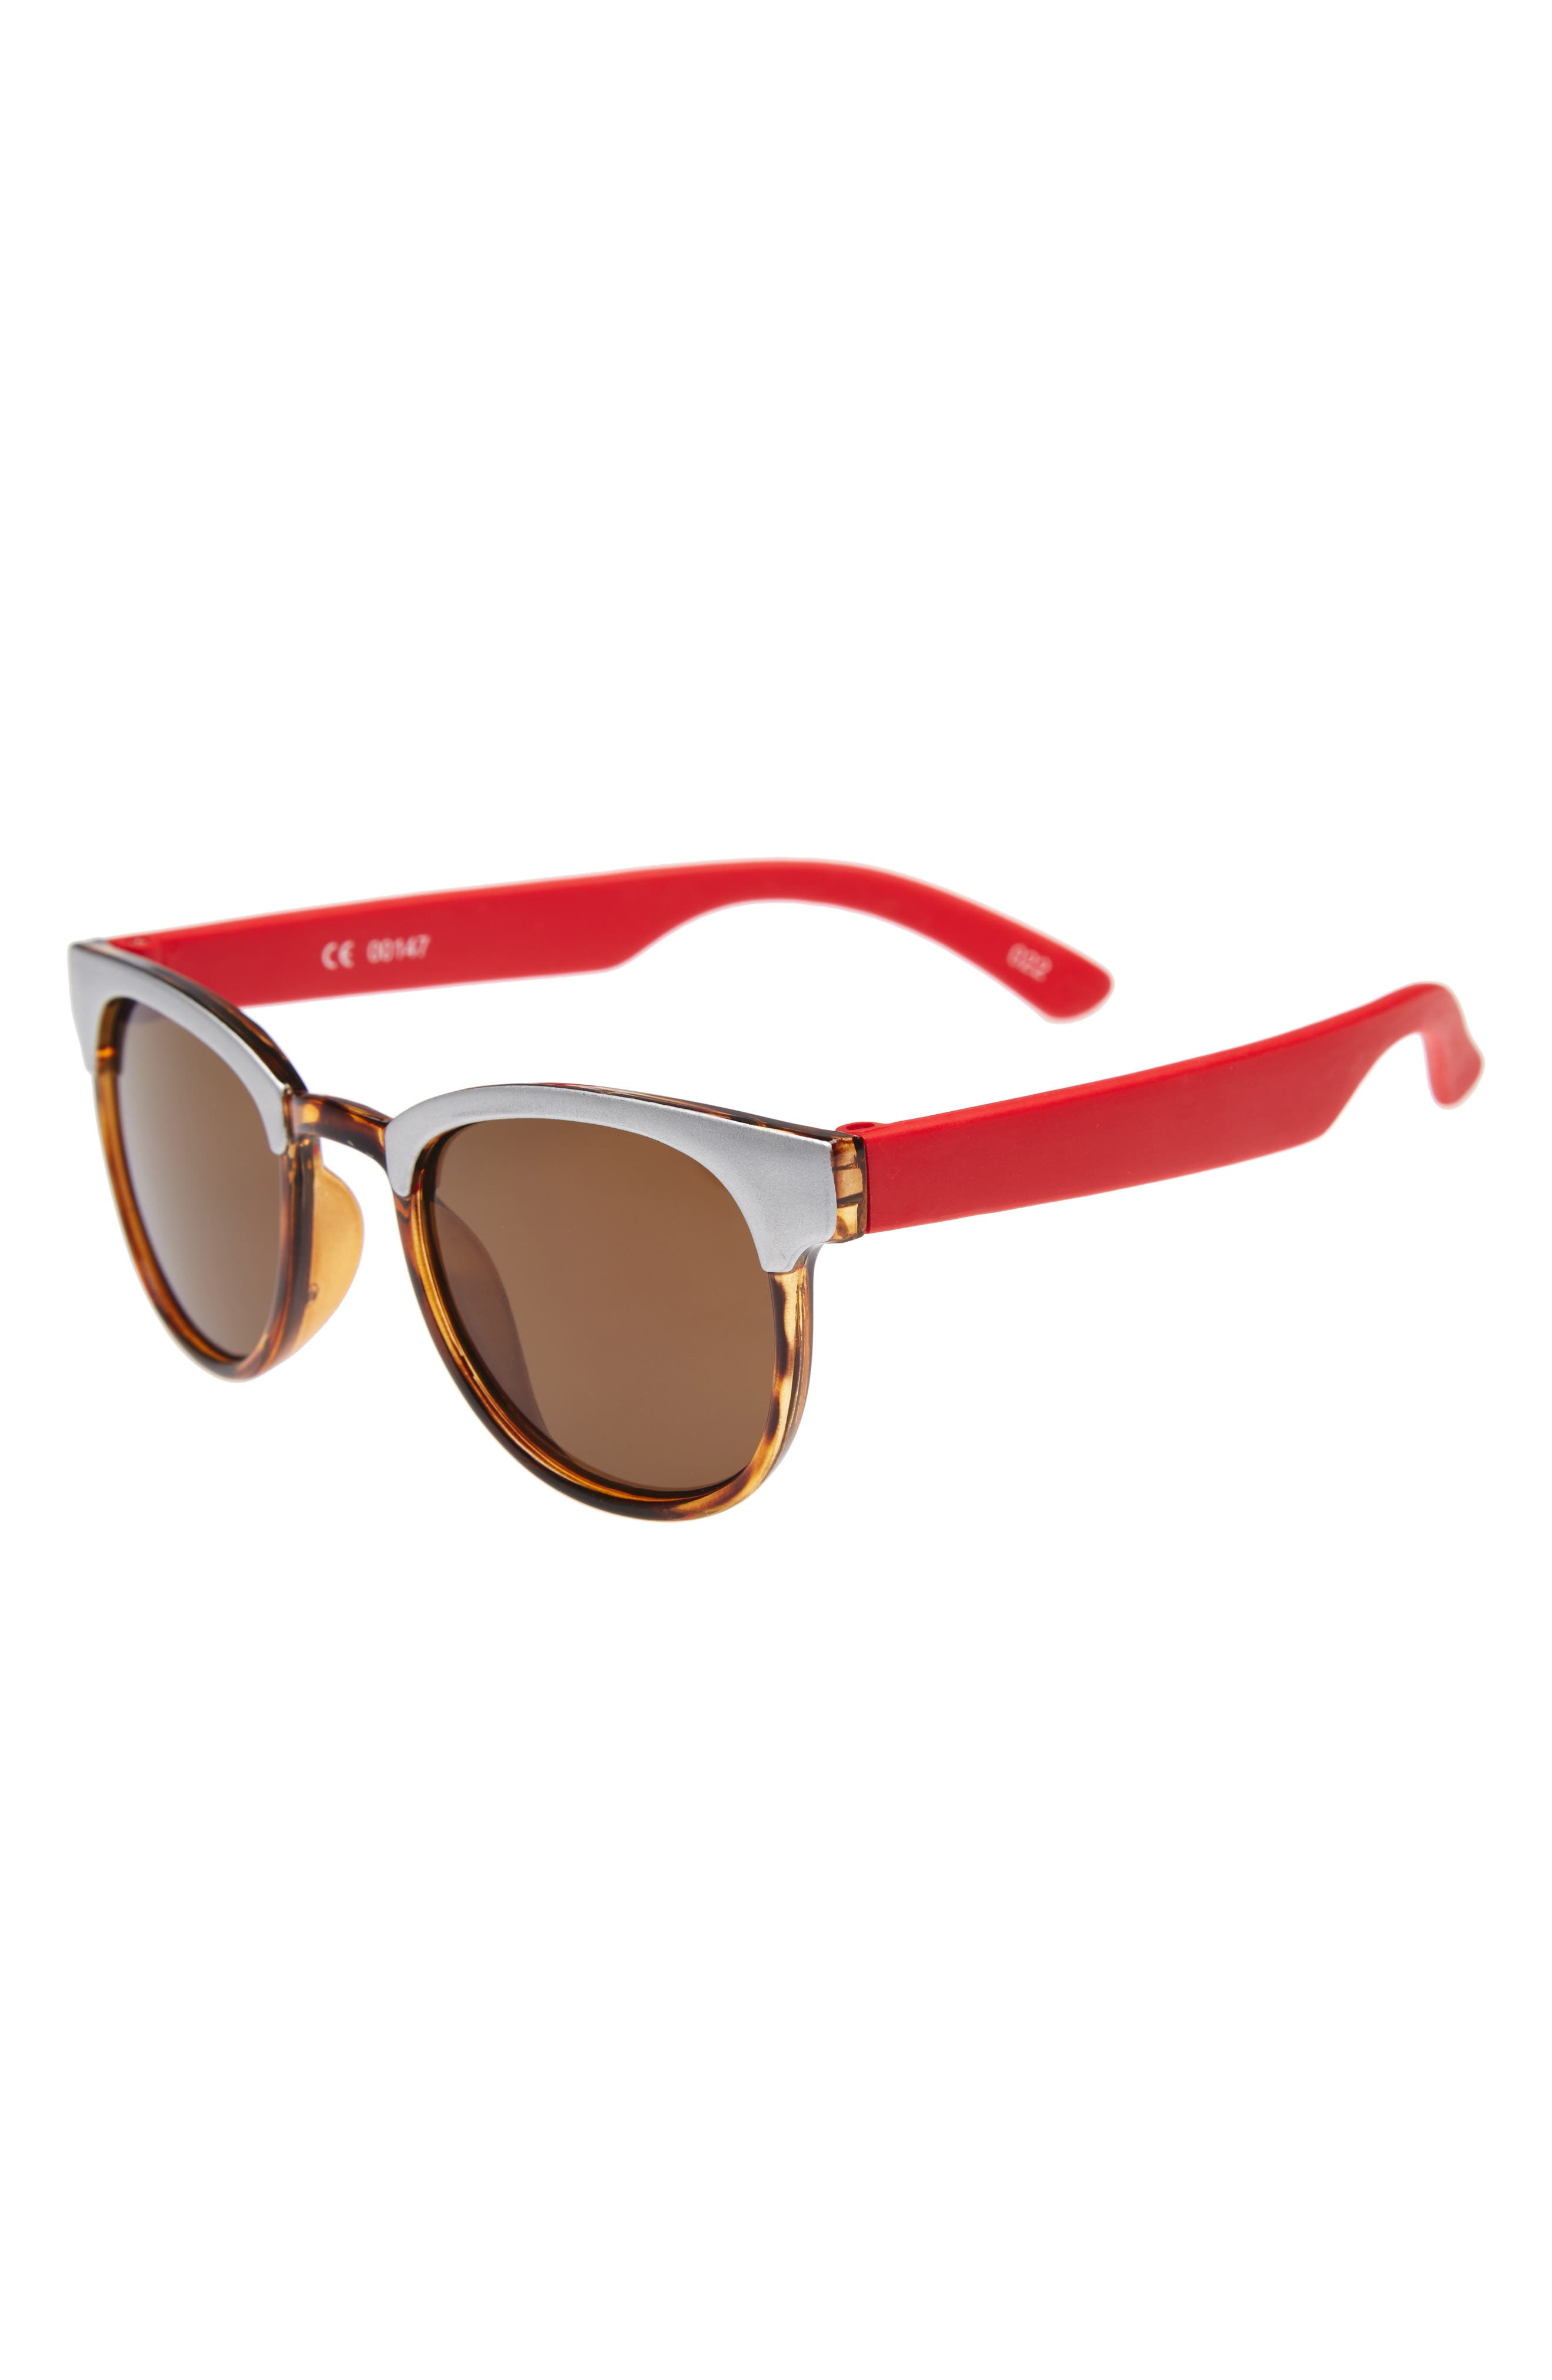 Main Image - Starlight Accessories Sunglasses (Boys)